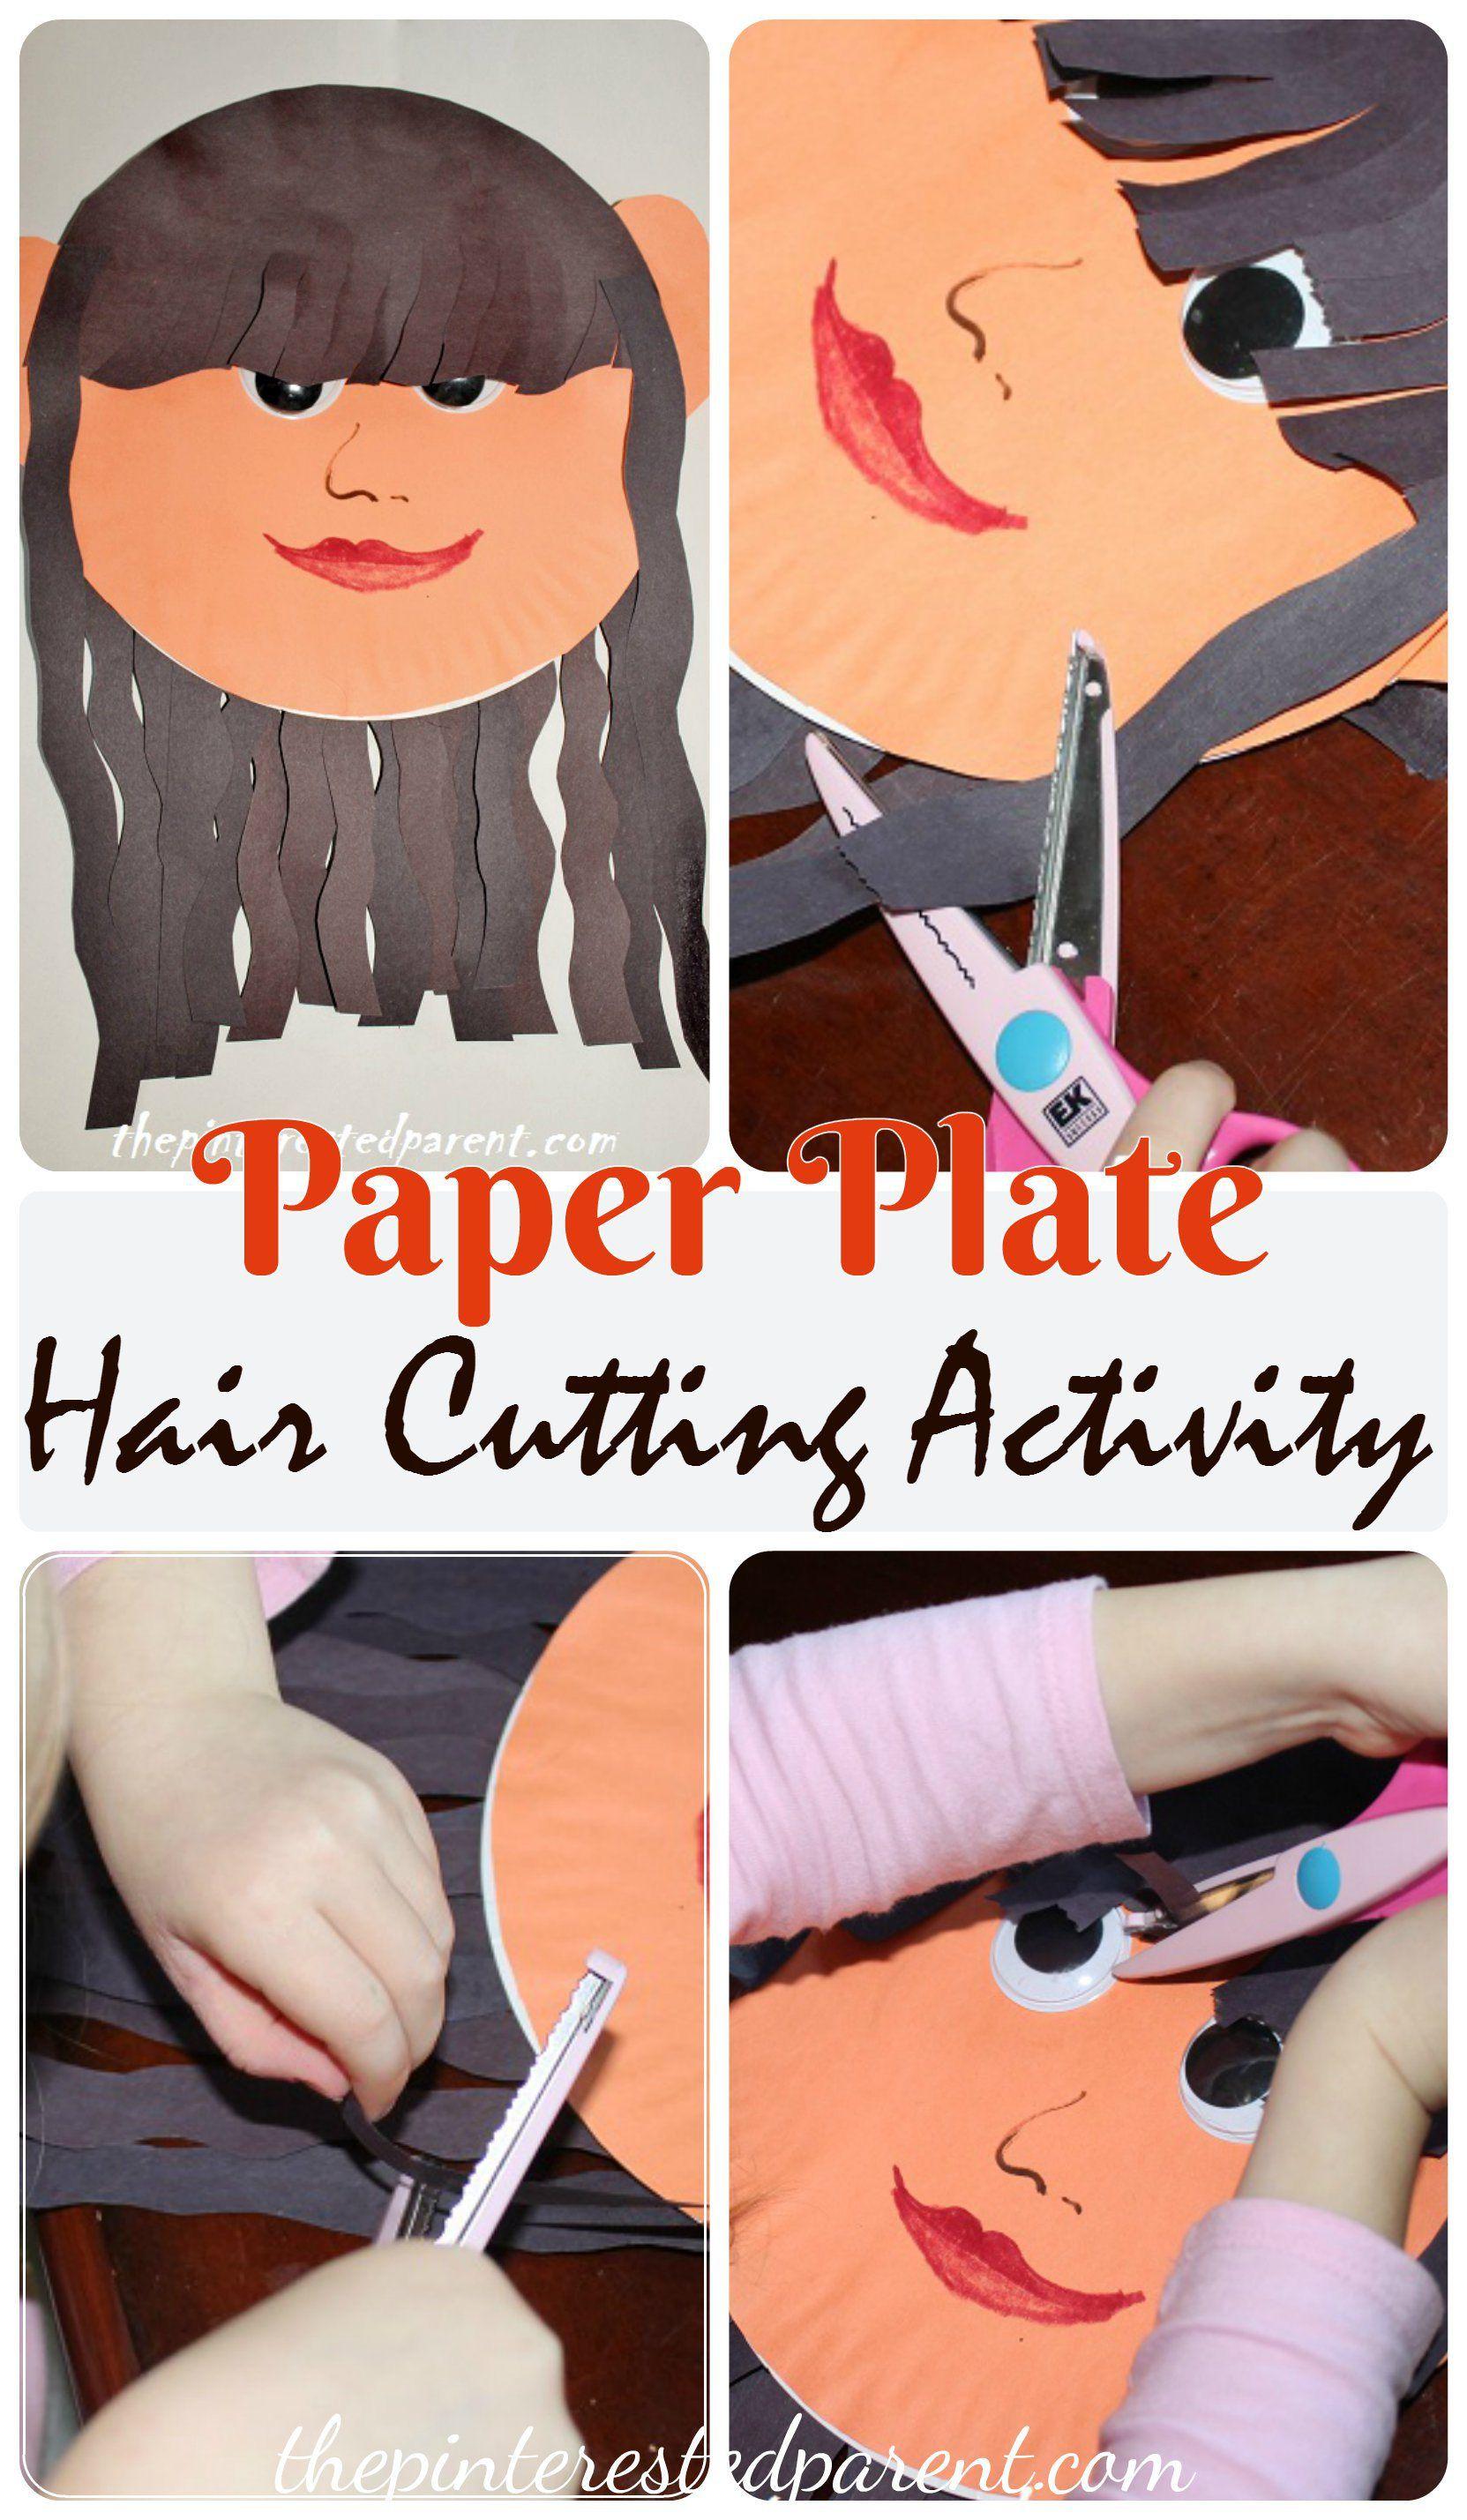 paper plate hair cutting activity child development pinterest cutting activities motor. Black Bedroom Furniture Sets. Home Design Ideas